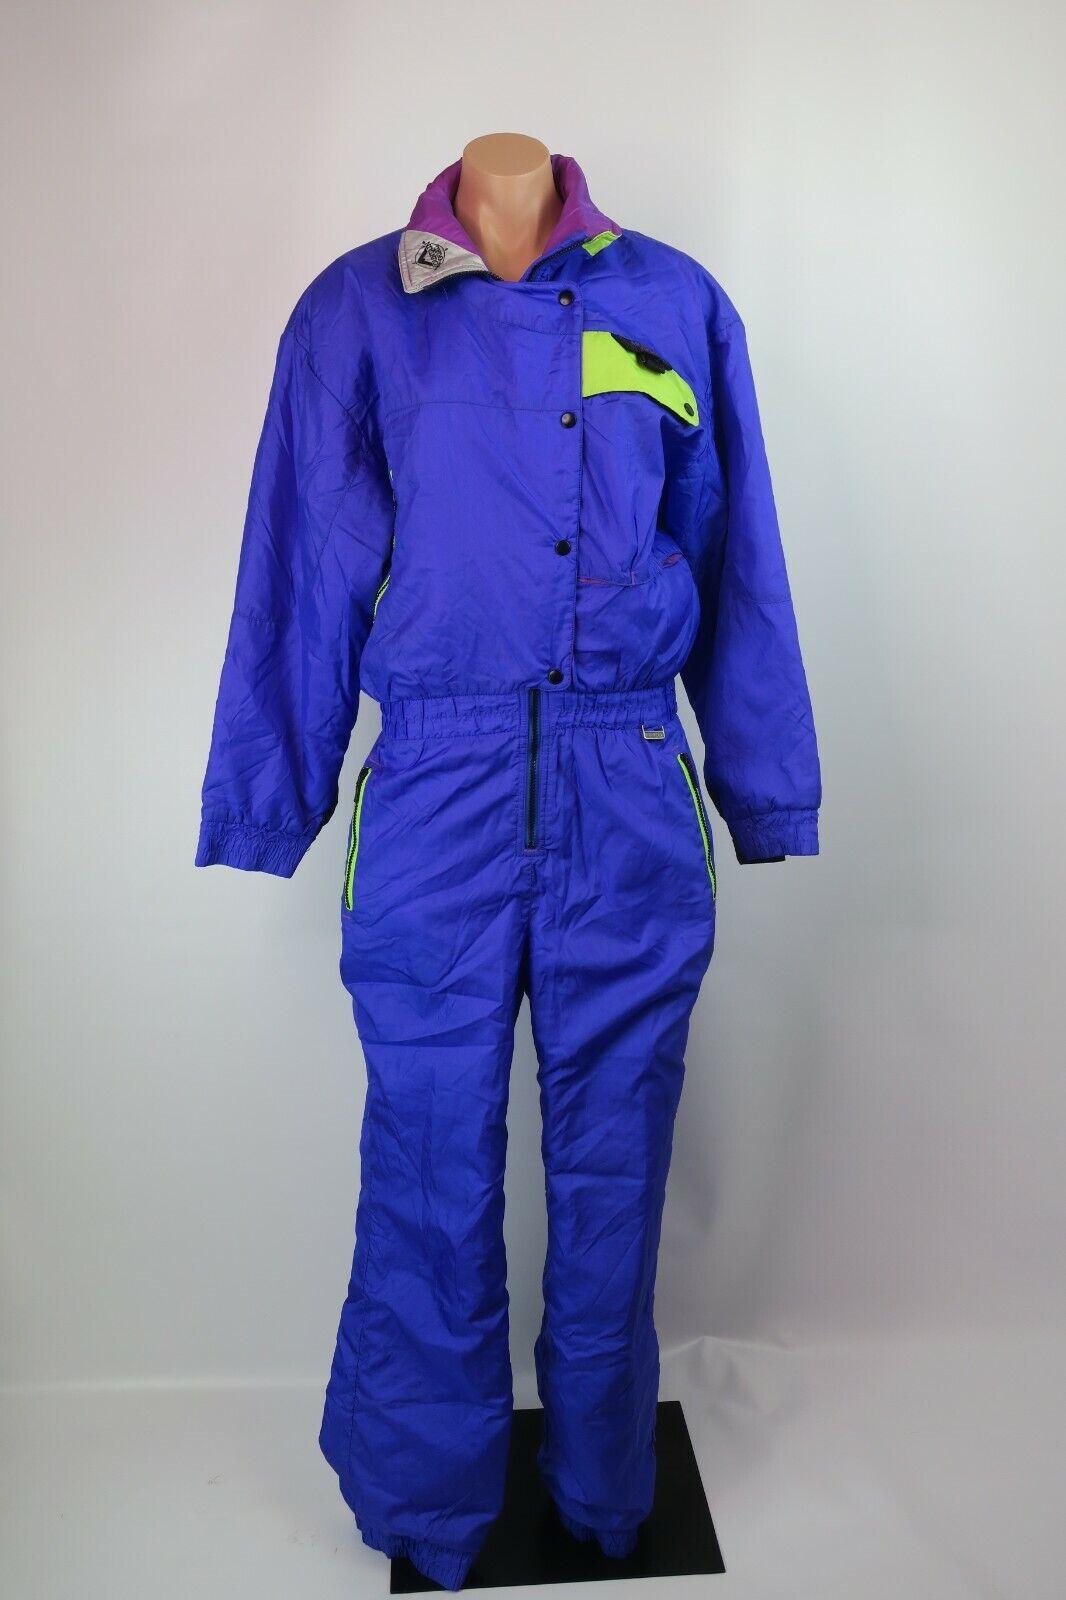 Vtg 80s 90s  Neon Womens PURPLE SKI SUIT One Piece Snow Bib Sz 14 MOUNTAIN GOAT  new products novelty items